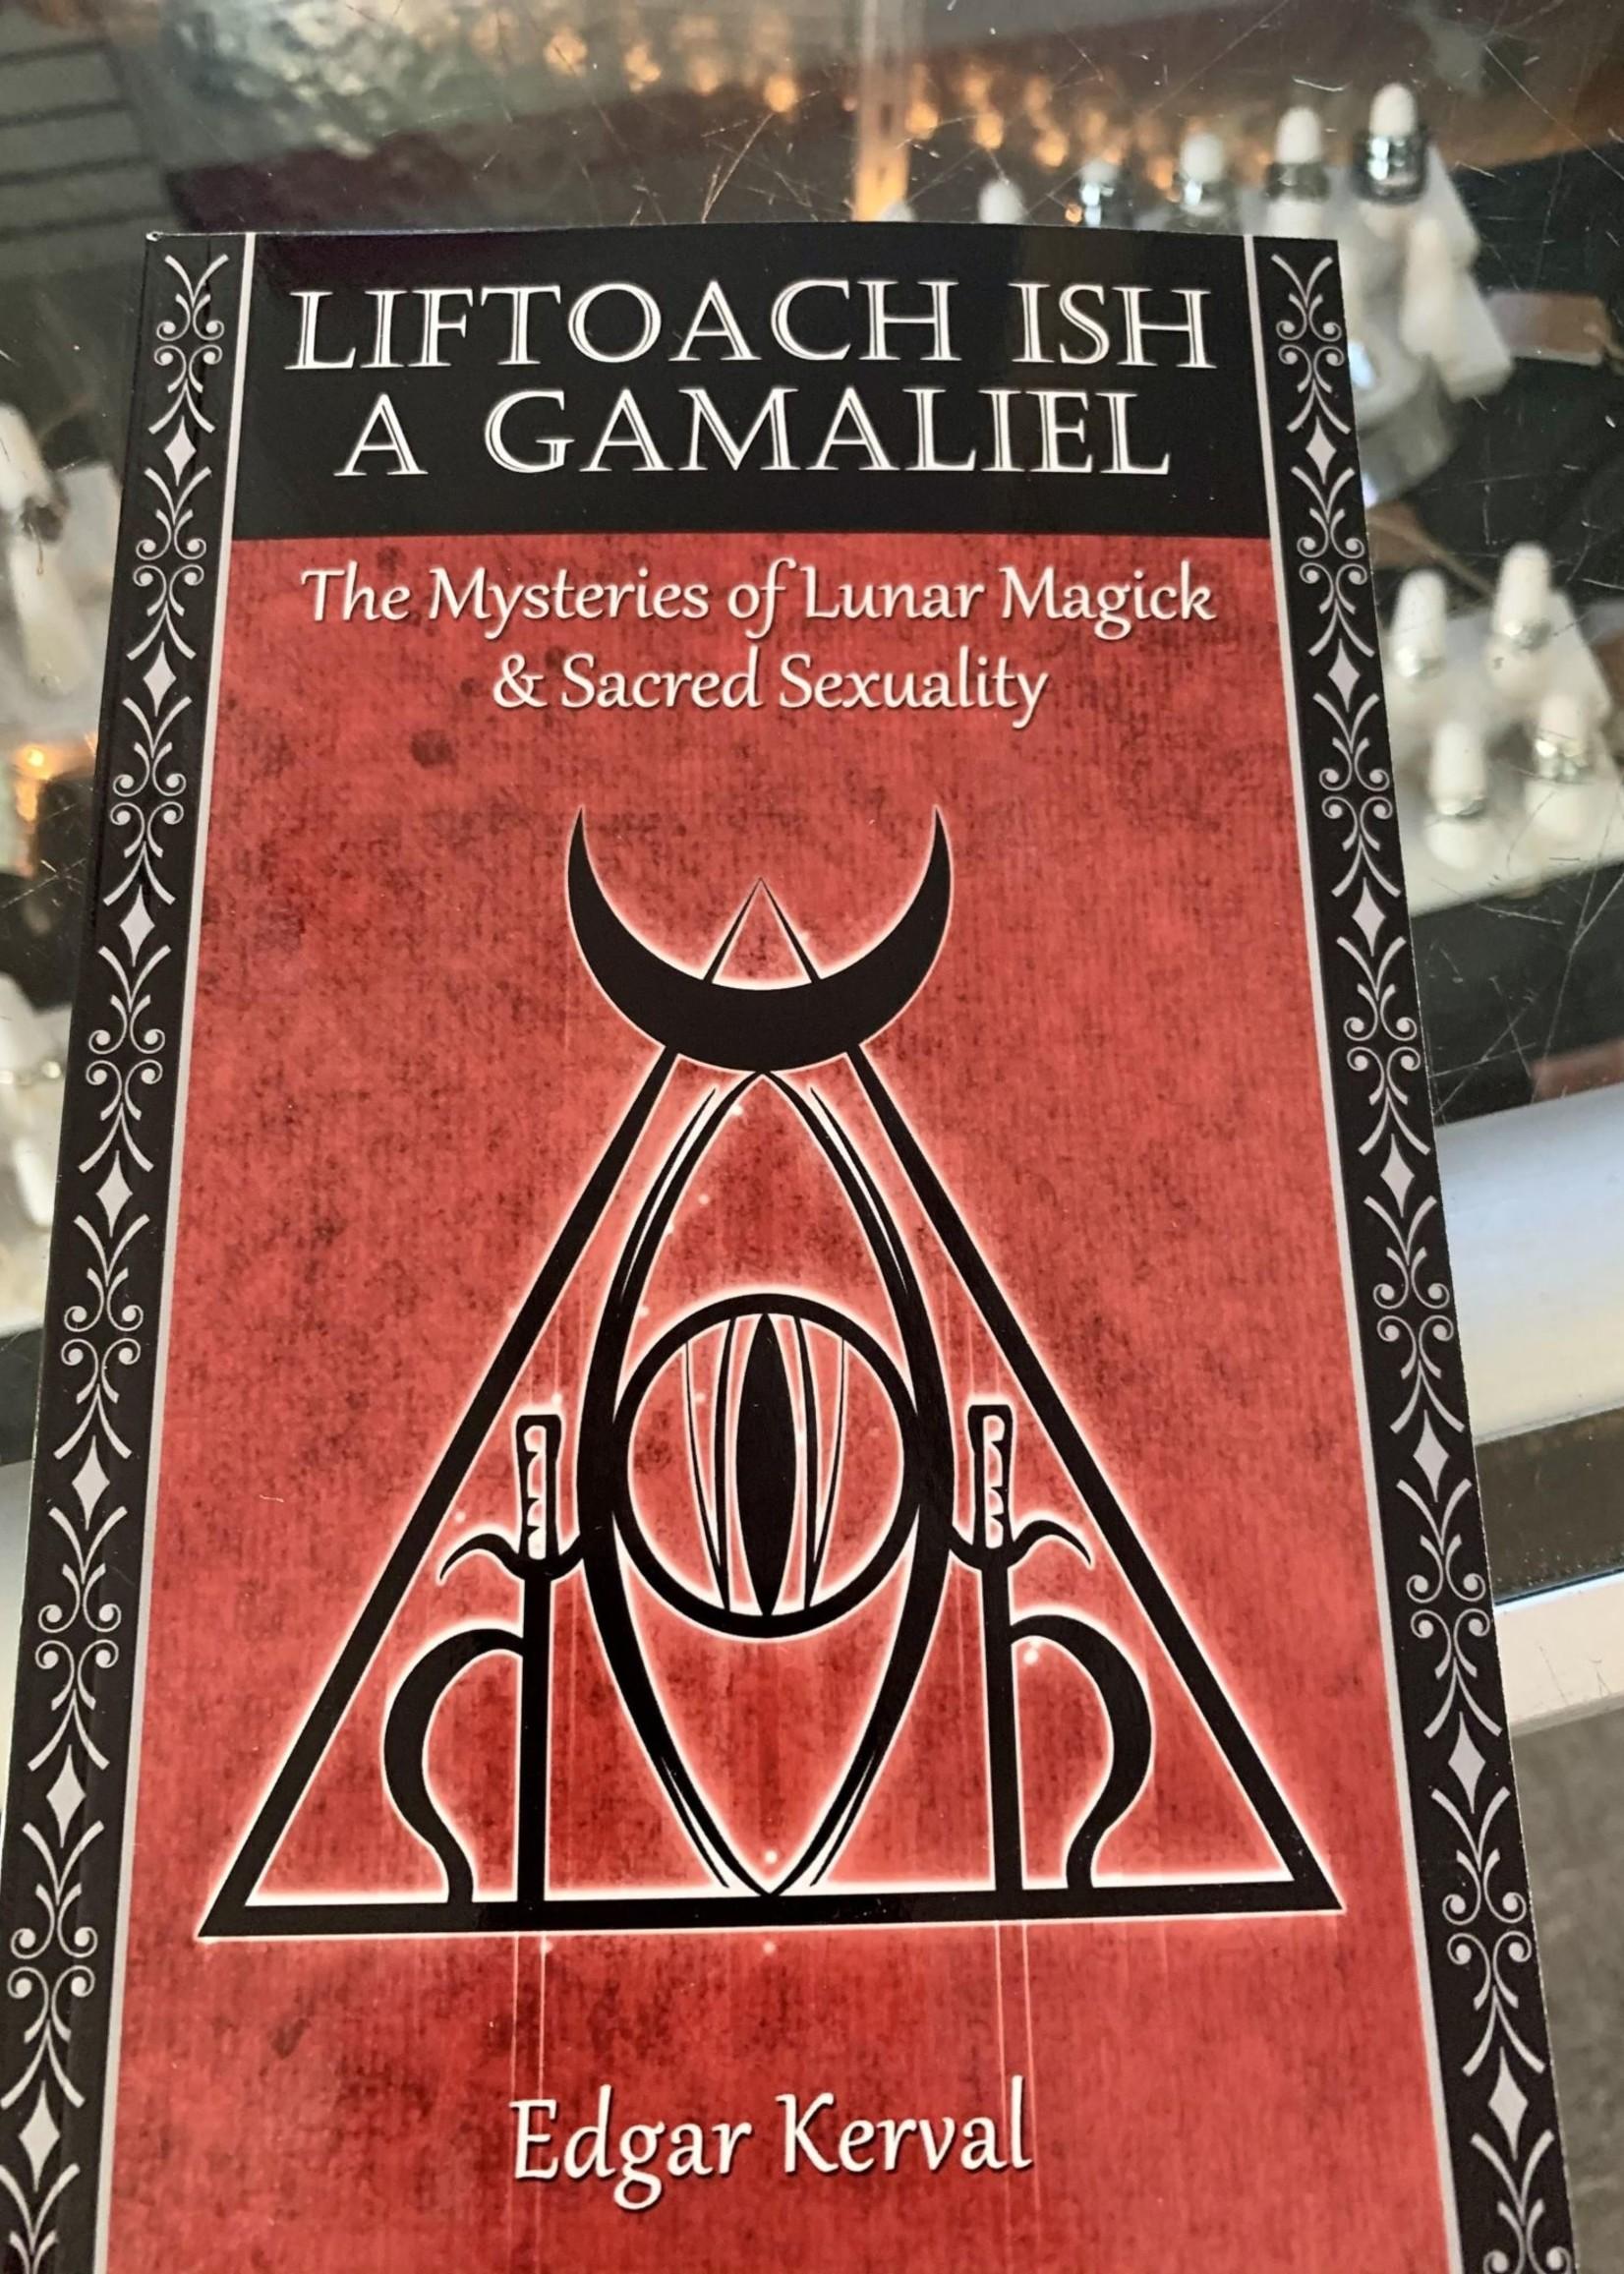 Liftoach Ish A Gamaliel - Edgar Kerval